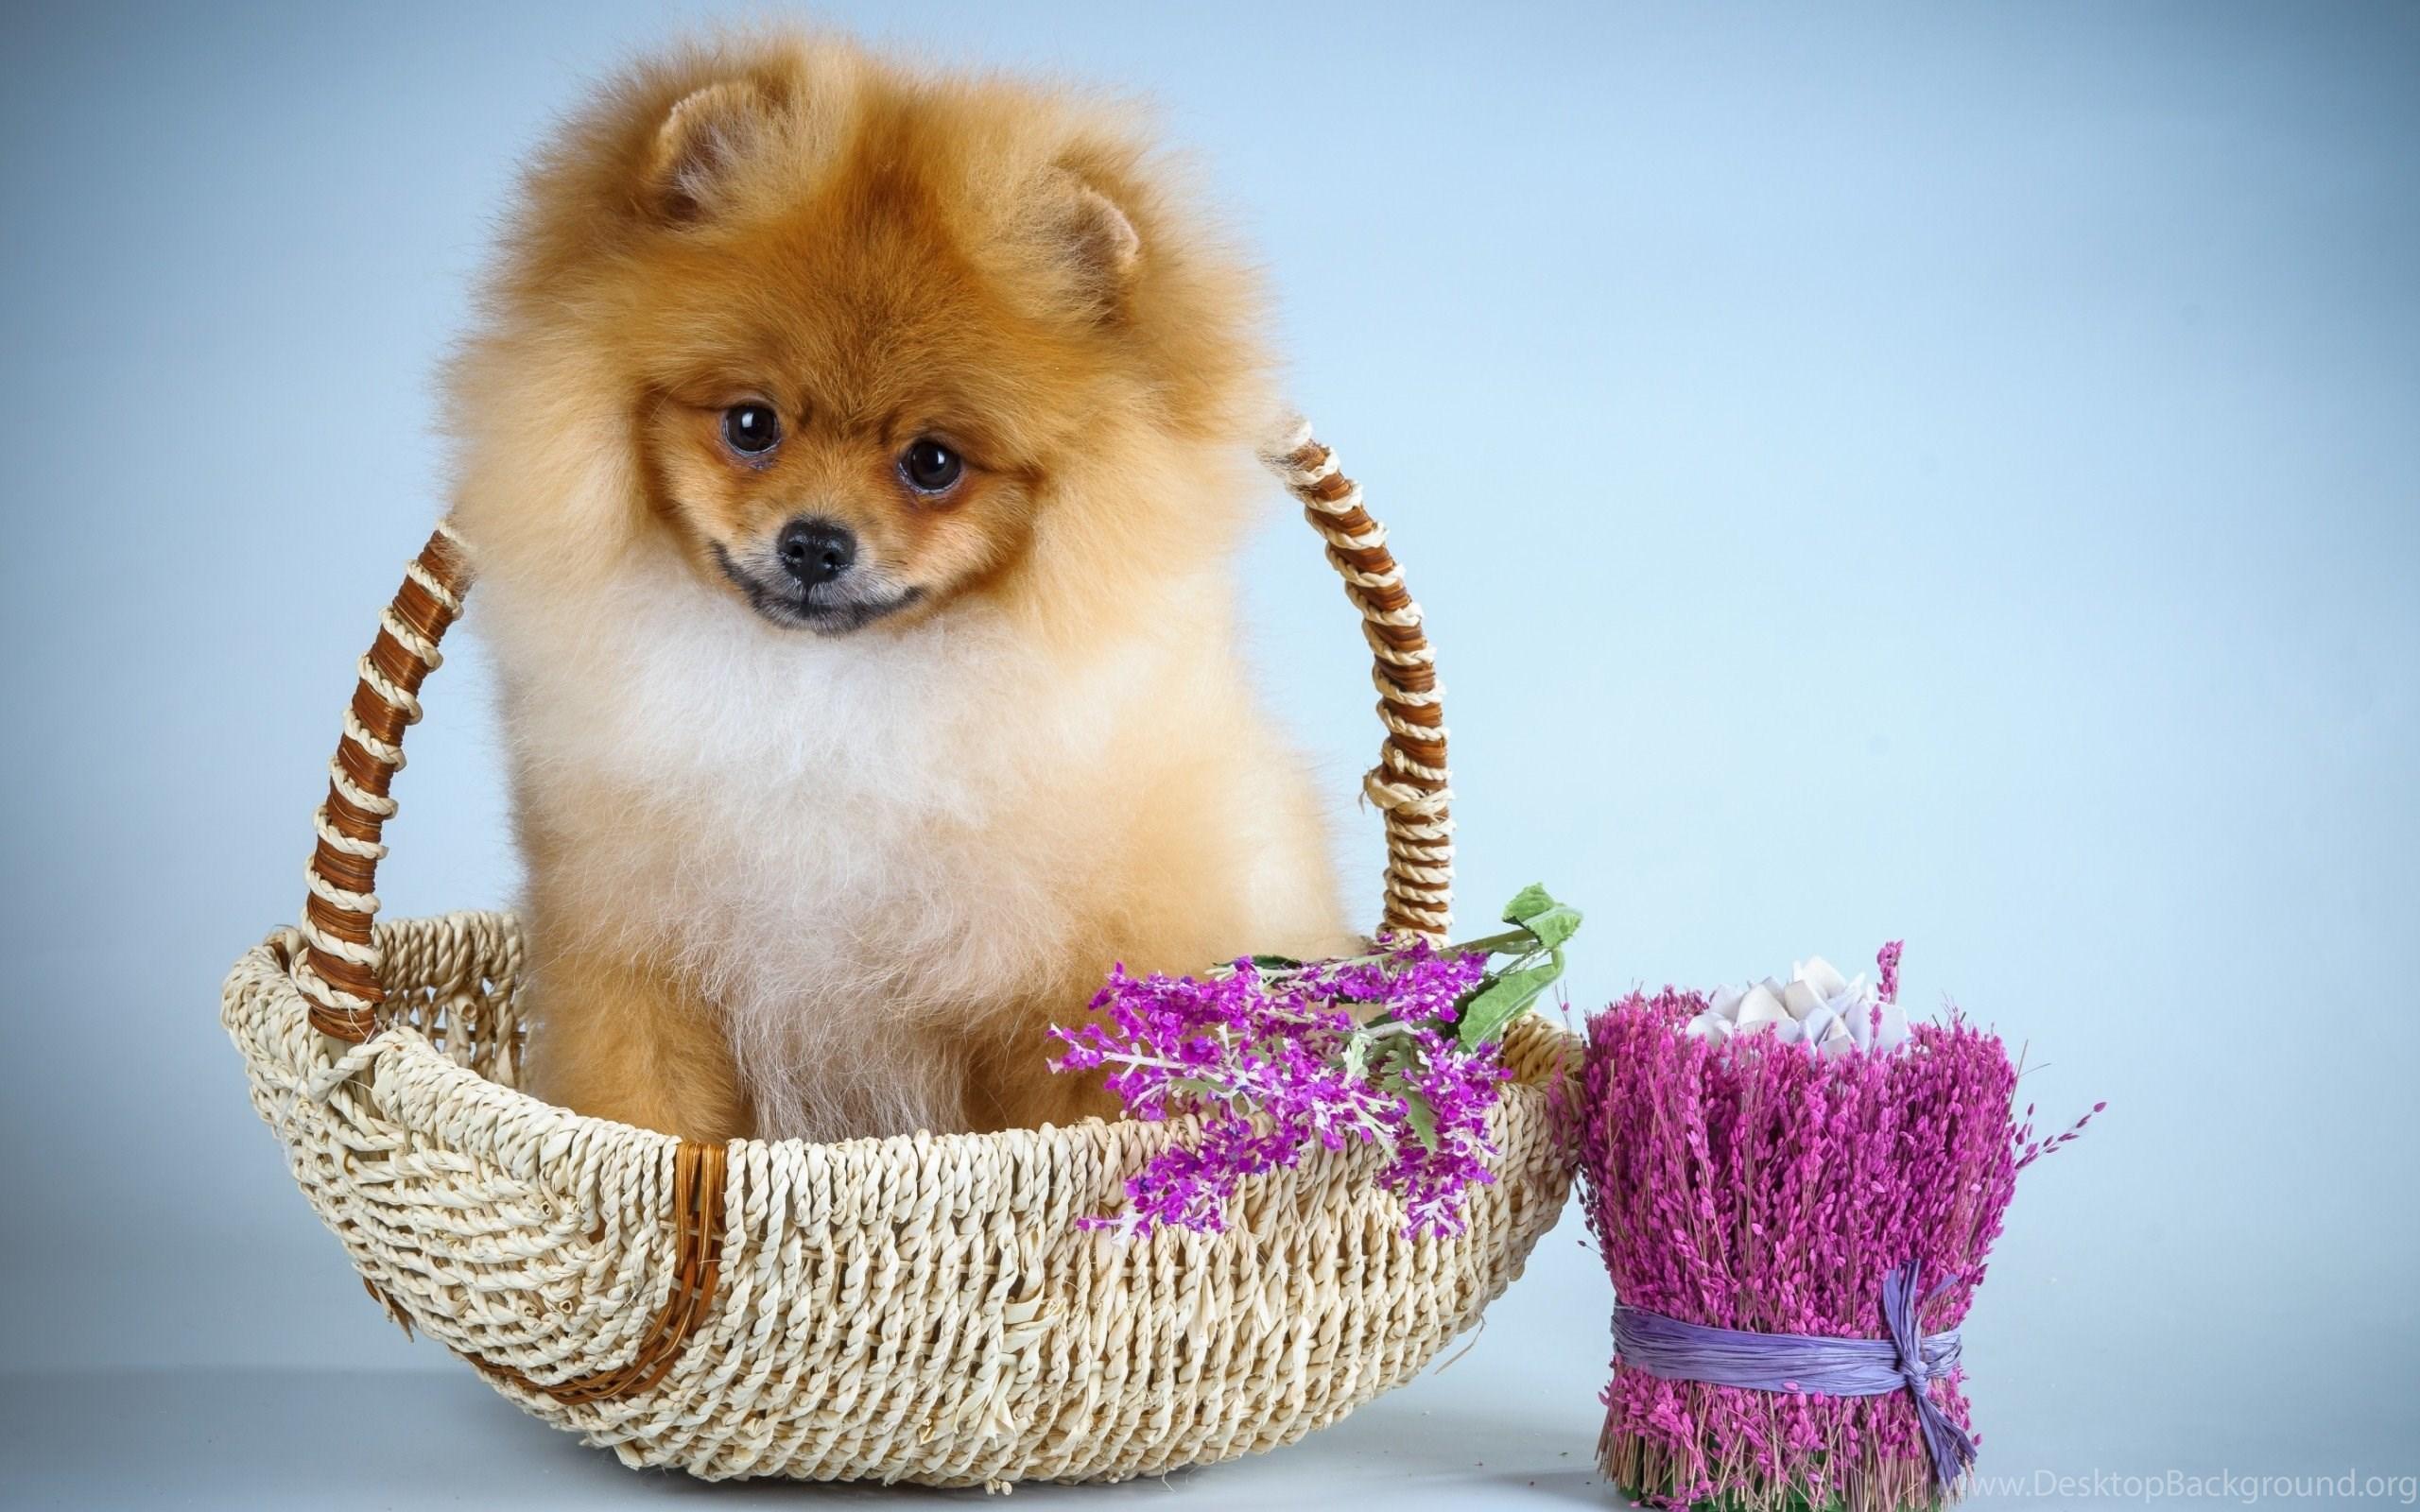 Dogs Cute Blue Pink Flower Dog Sweet Animal Pomeranian Puppy